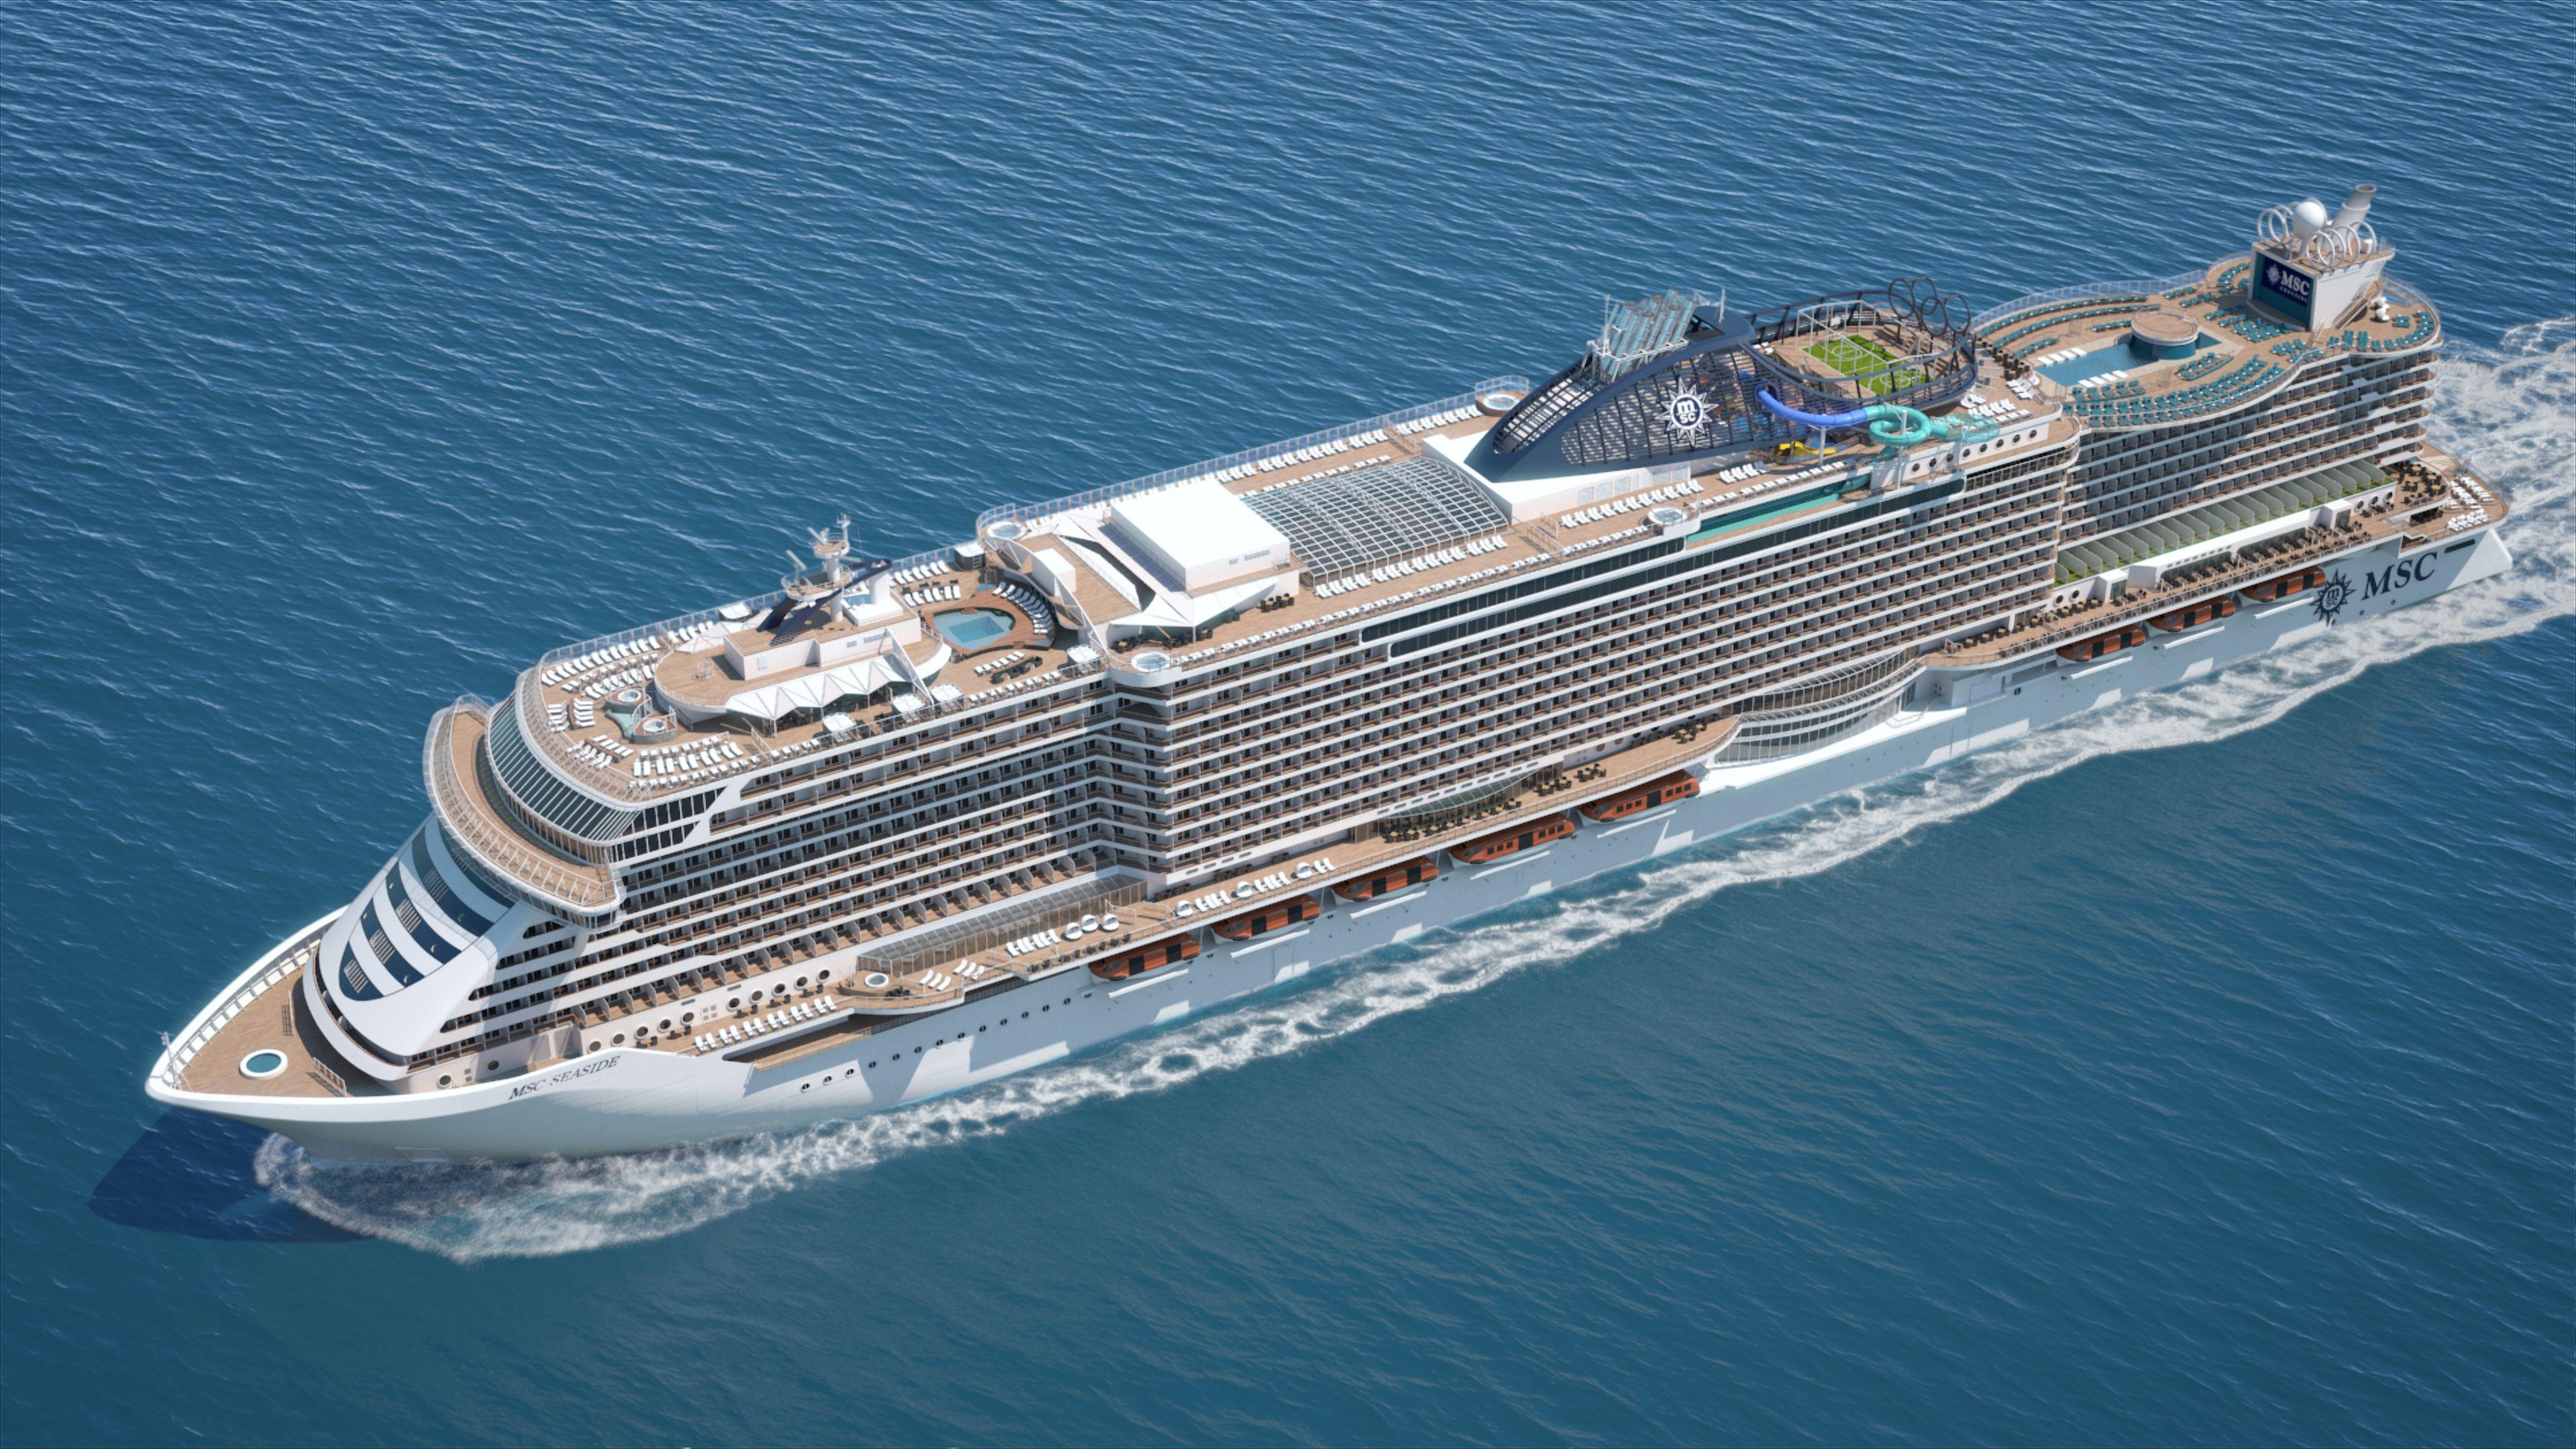 b28a0e7a811 MSC Seaside Cheap Cruises, Msc Cruises, Msc Divina, Best Cruise Deals,  Cruise